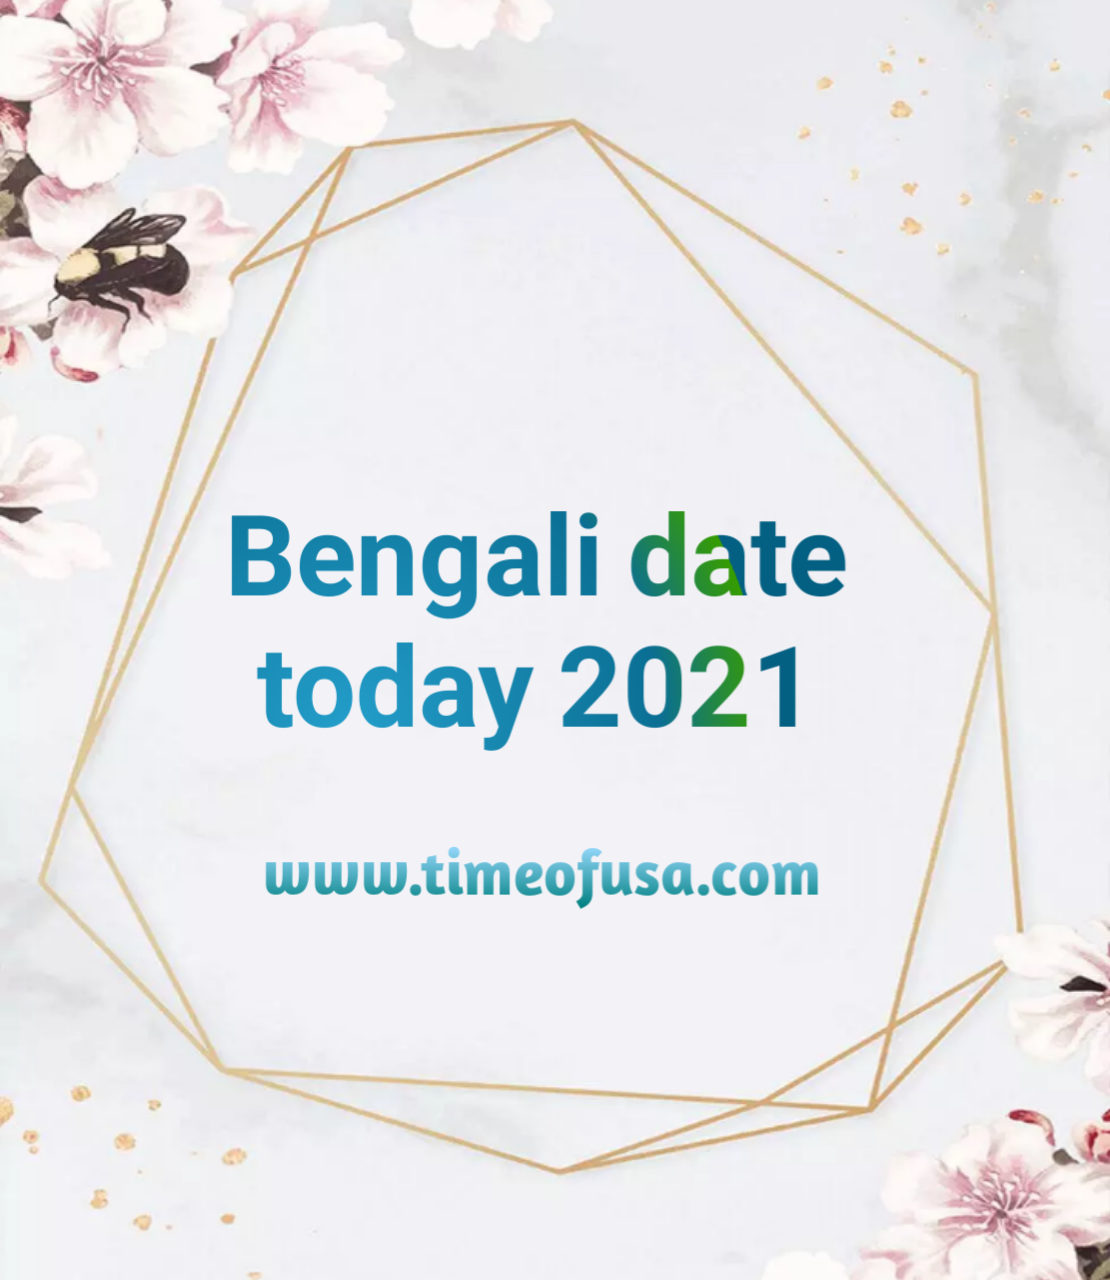 bengali date today, বাংলা ক্যালেন্ডার, panjika bengali, panjika bangla, bengali panjika, bangla date today, today bangla date, today, bengali calendar, bengali calendar today, panjika, bangla tarikh, bengali panjika today, বাংলা পঞ্জিকা, বাংলা পঞ্জিকা ১৪২৭, আজকের বাংলা তারিখ 2021, bangla date today, today bangla date, bengali calendar today